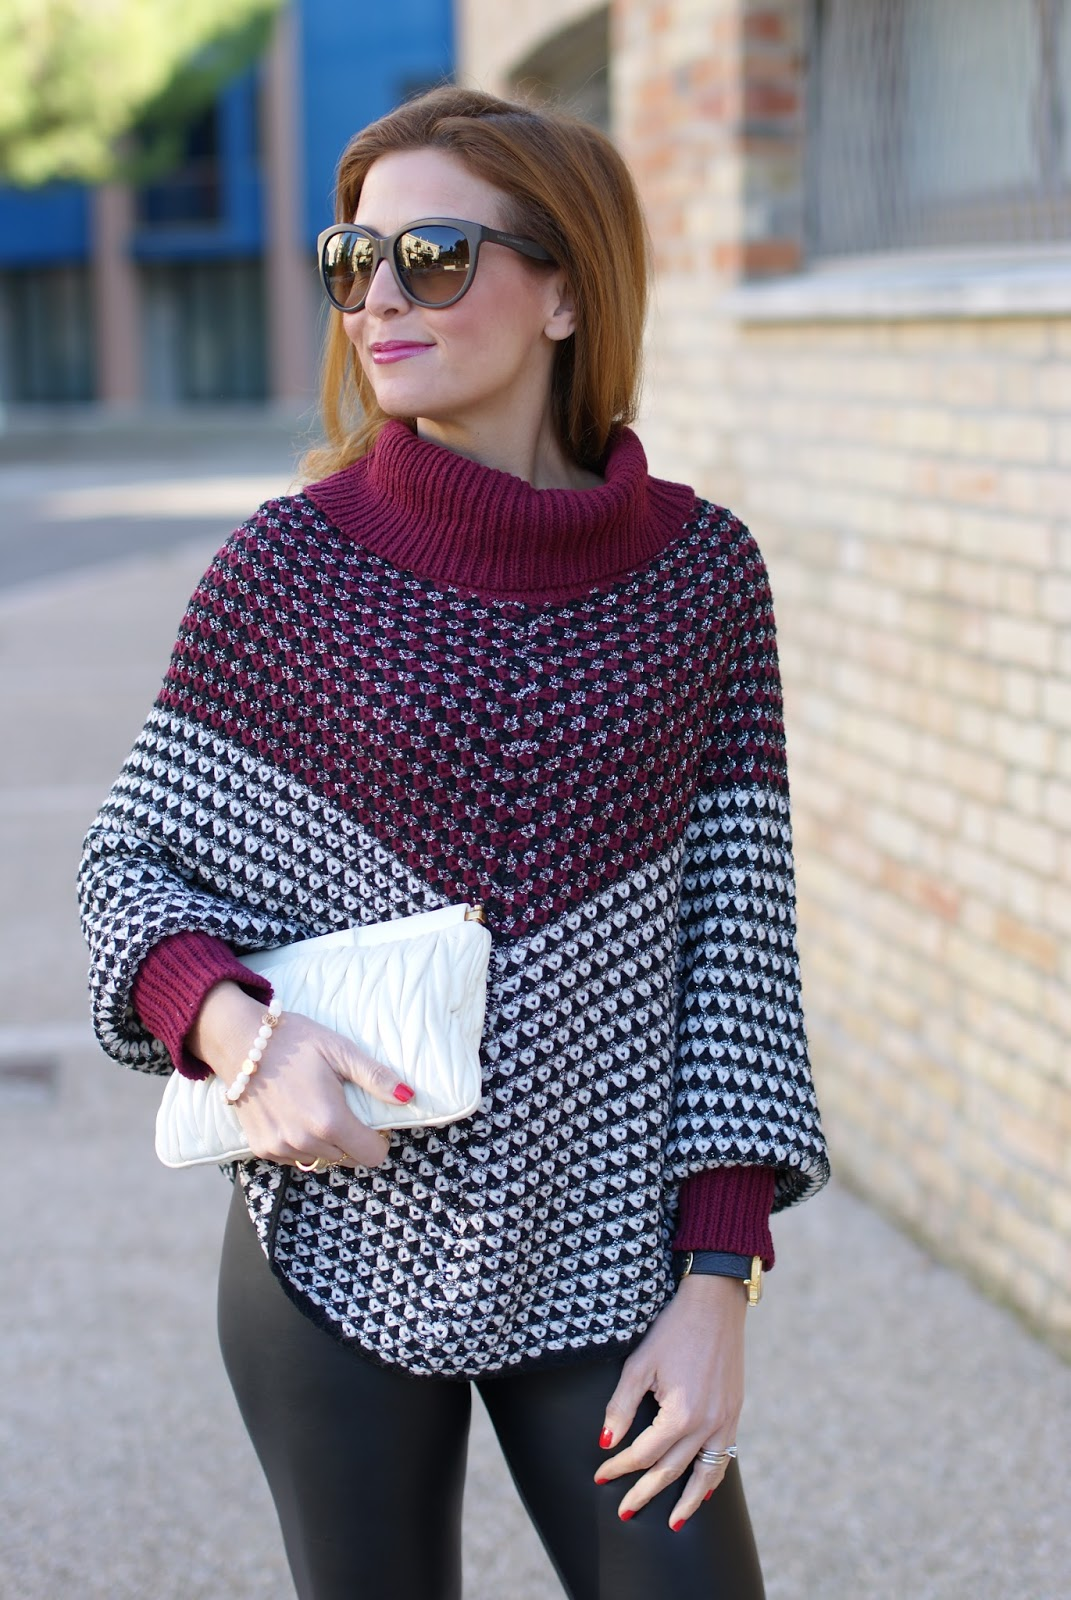 Miu Miu white clutch, Jadea leggings, leather leggings and Smash! Prolix sweater on Fashion and Cookies fashion blog, fashion blogger style